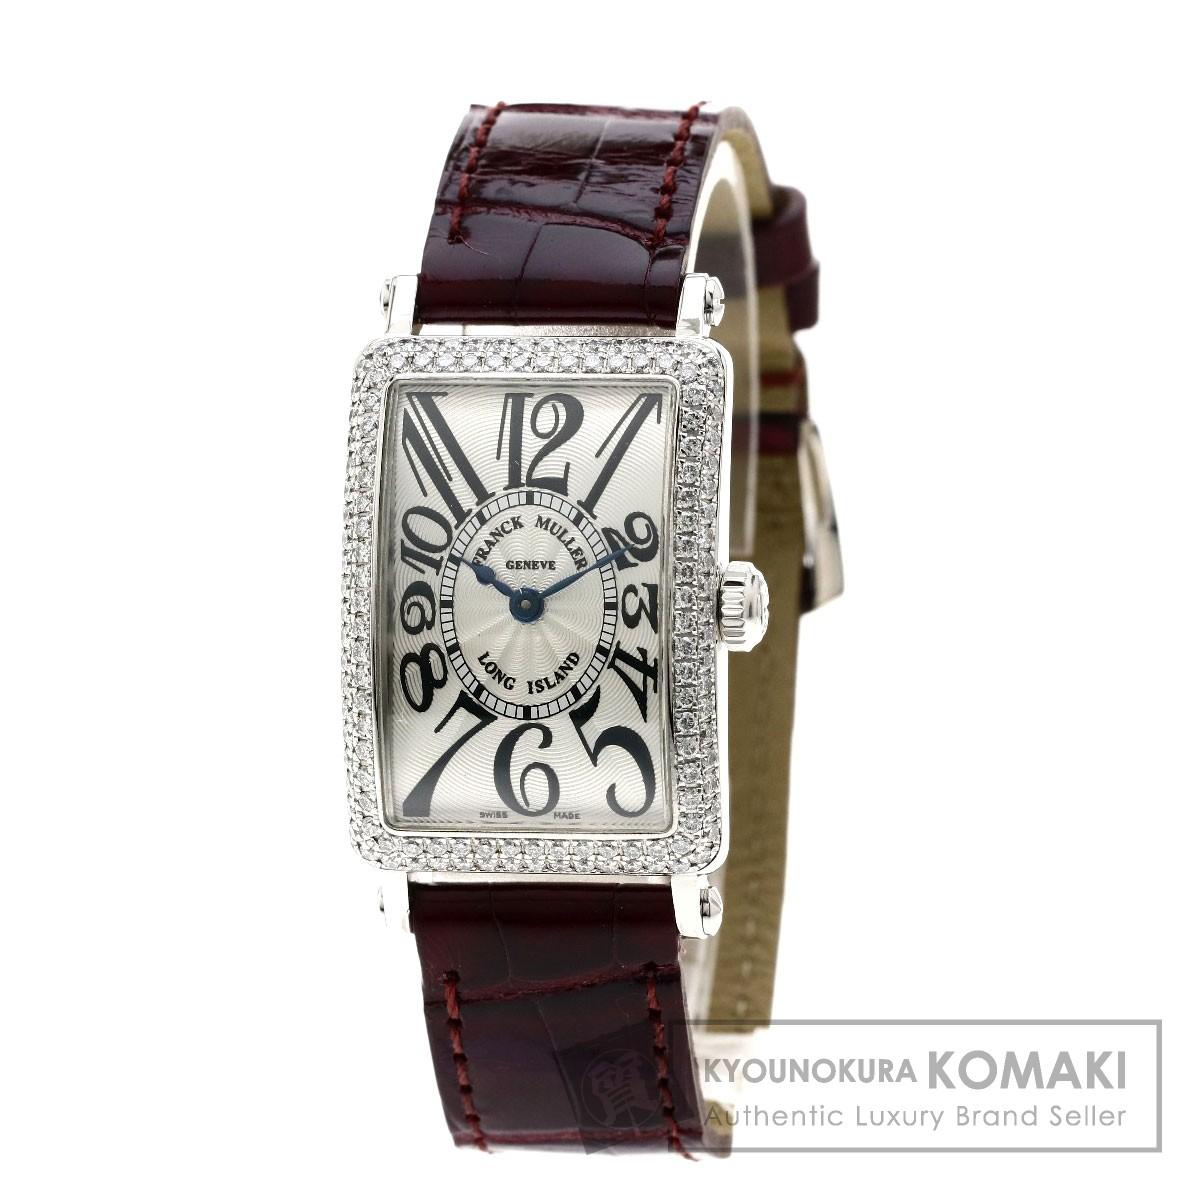 FRANCK MULLER 902QZD ロングアイランド/ダイヤモンド 腕時計 K18ホワイトゴールド/革 レディース 【中古】【フランクミュラー】